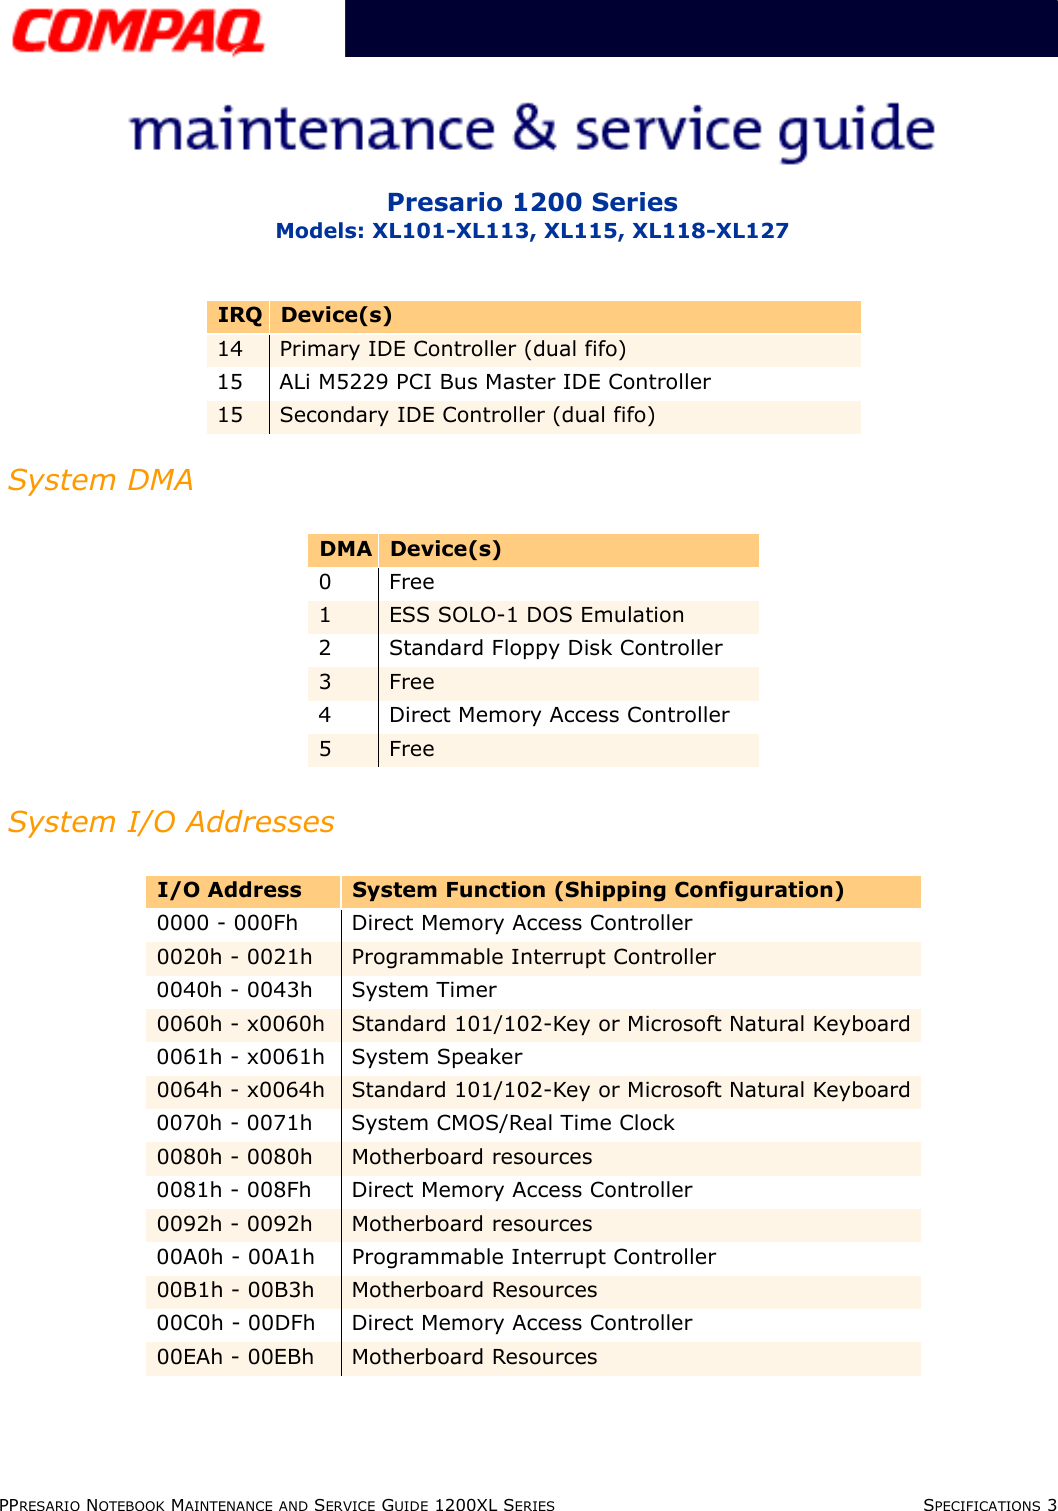 M5229 CHIPSET DRIVERS (2019)